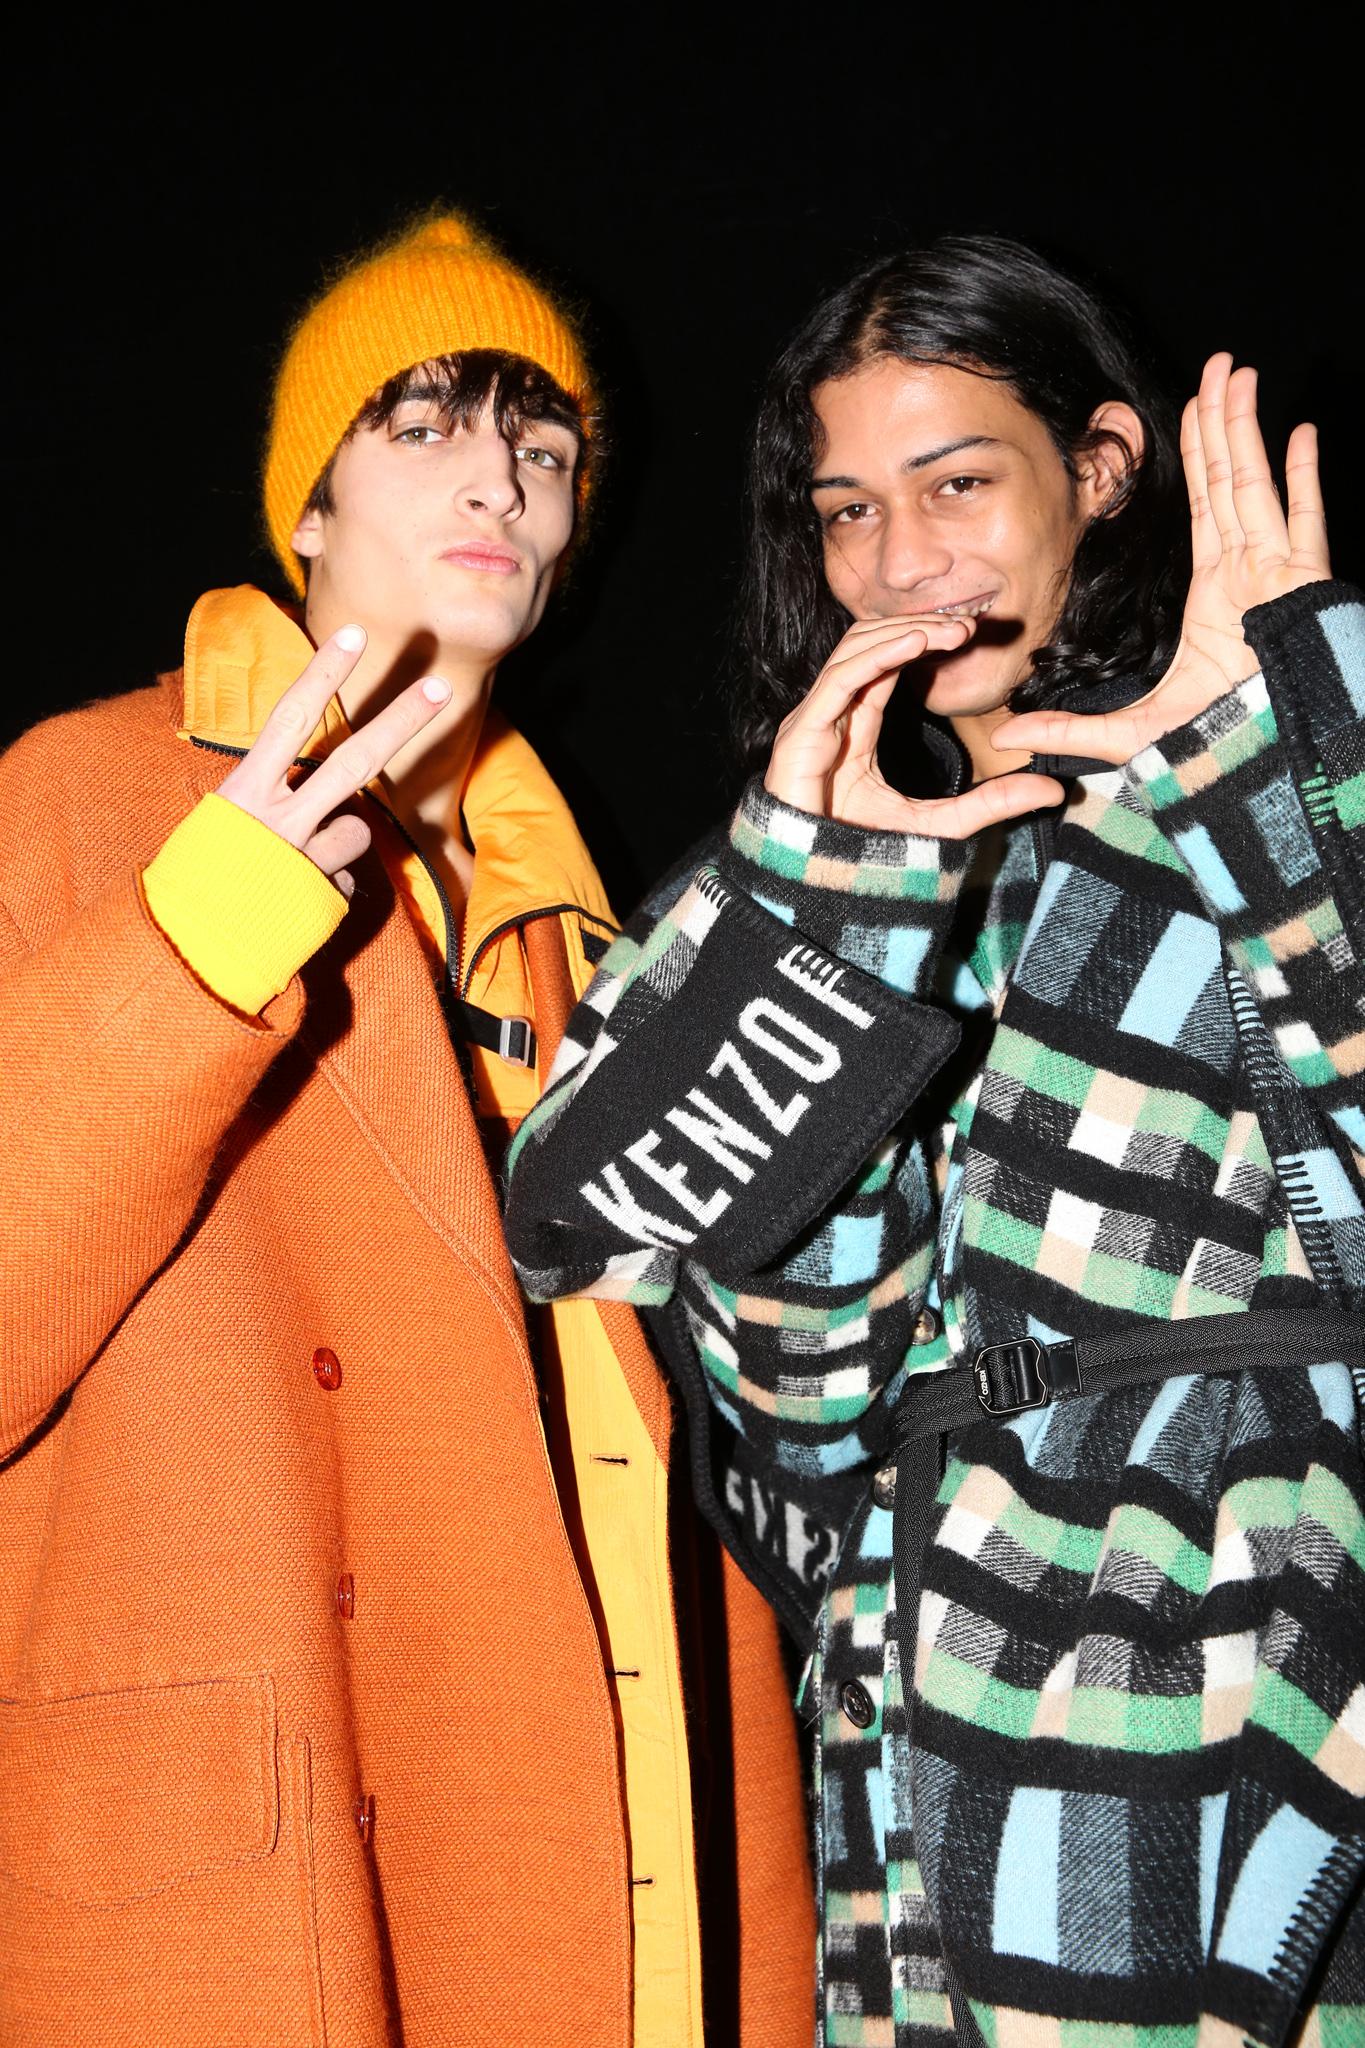 Backstage at Kenzo Fall 2019